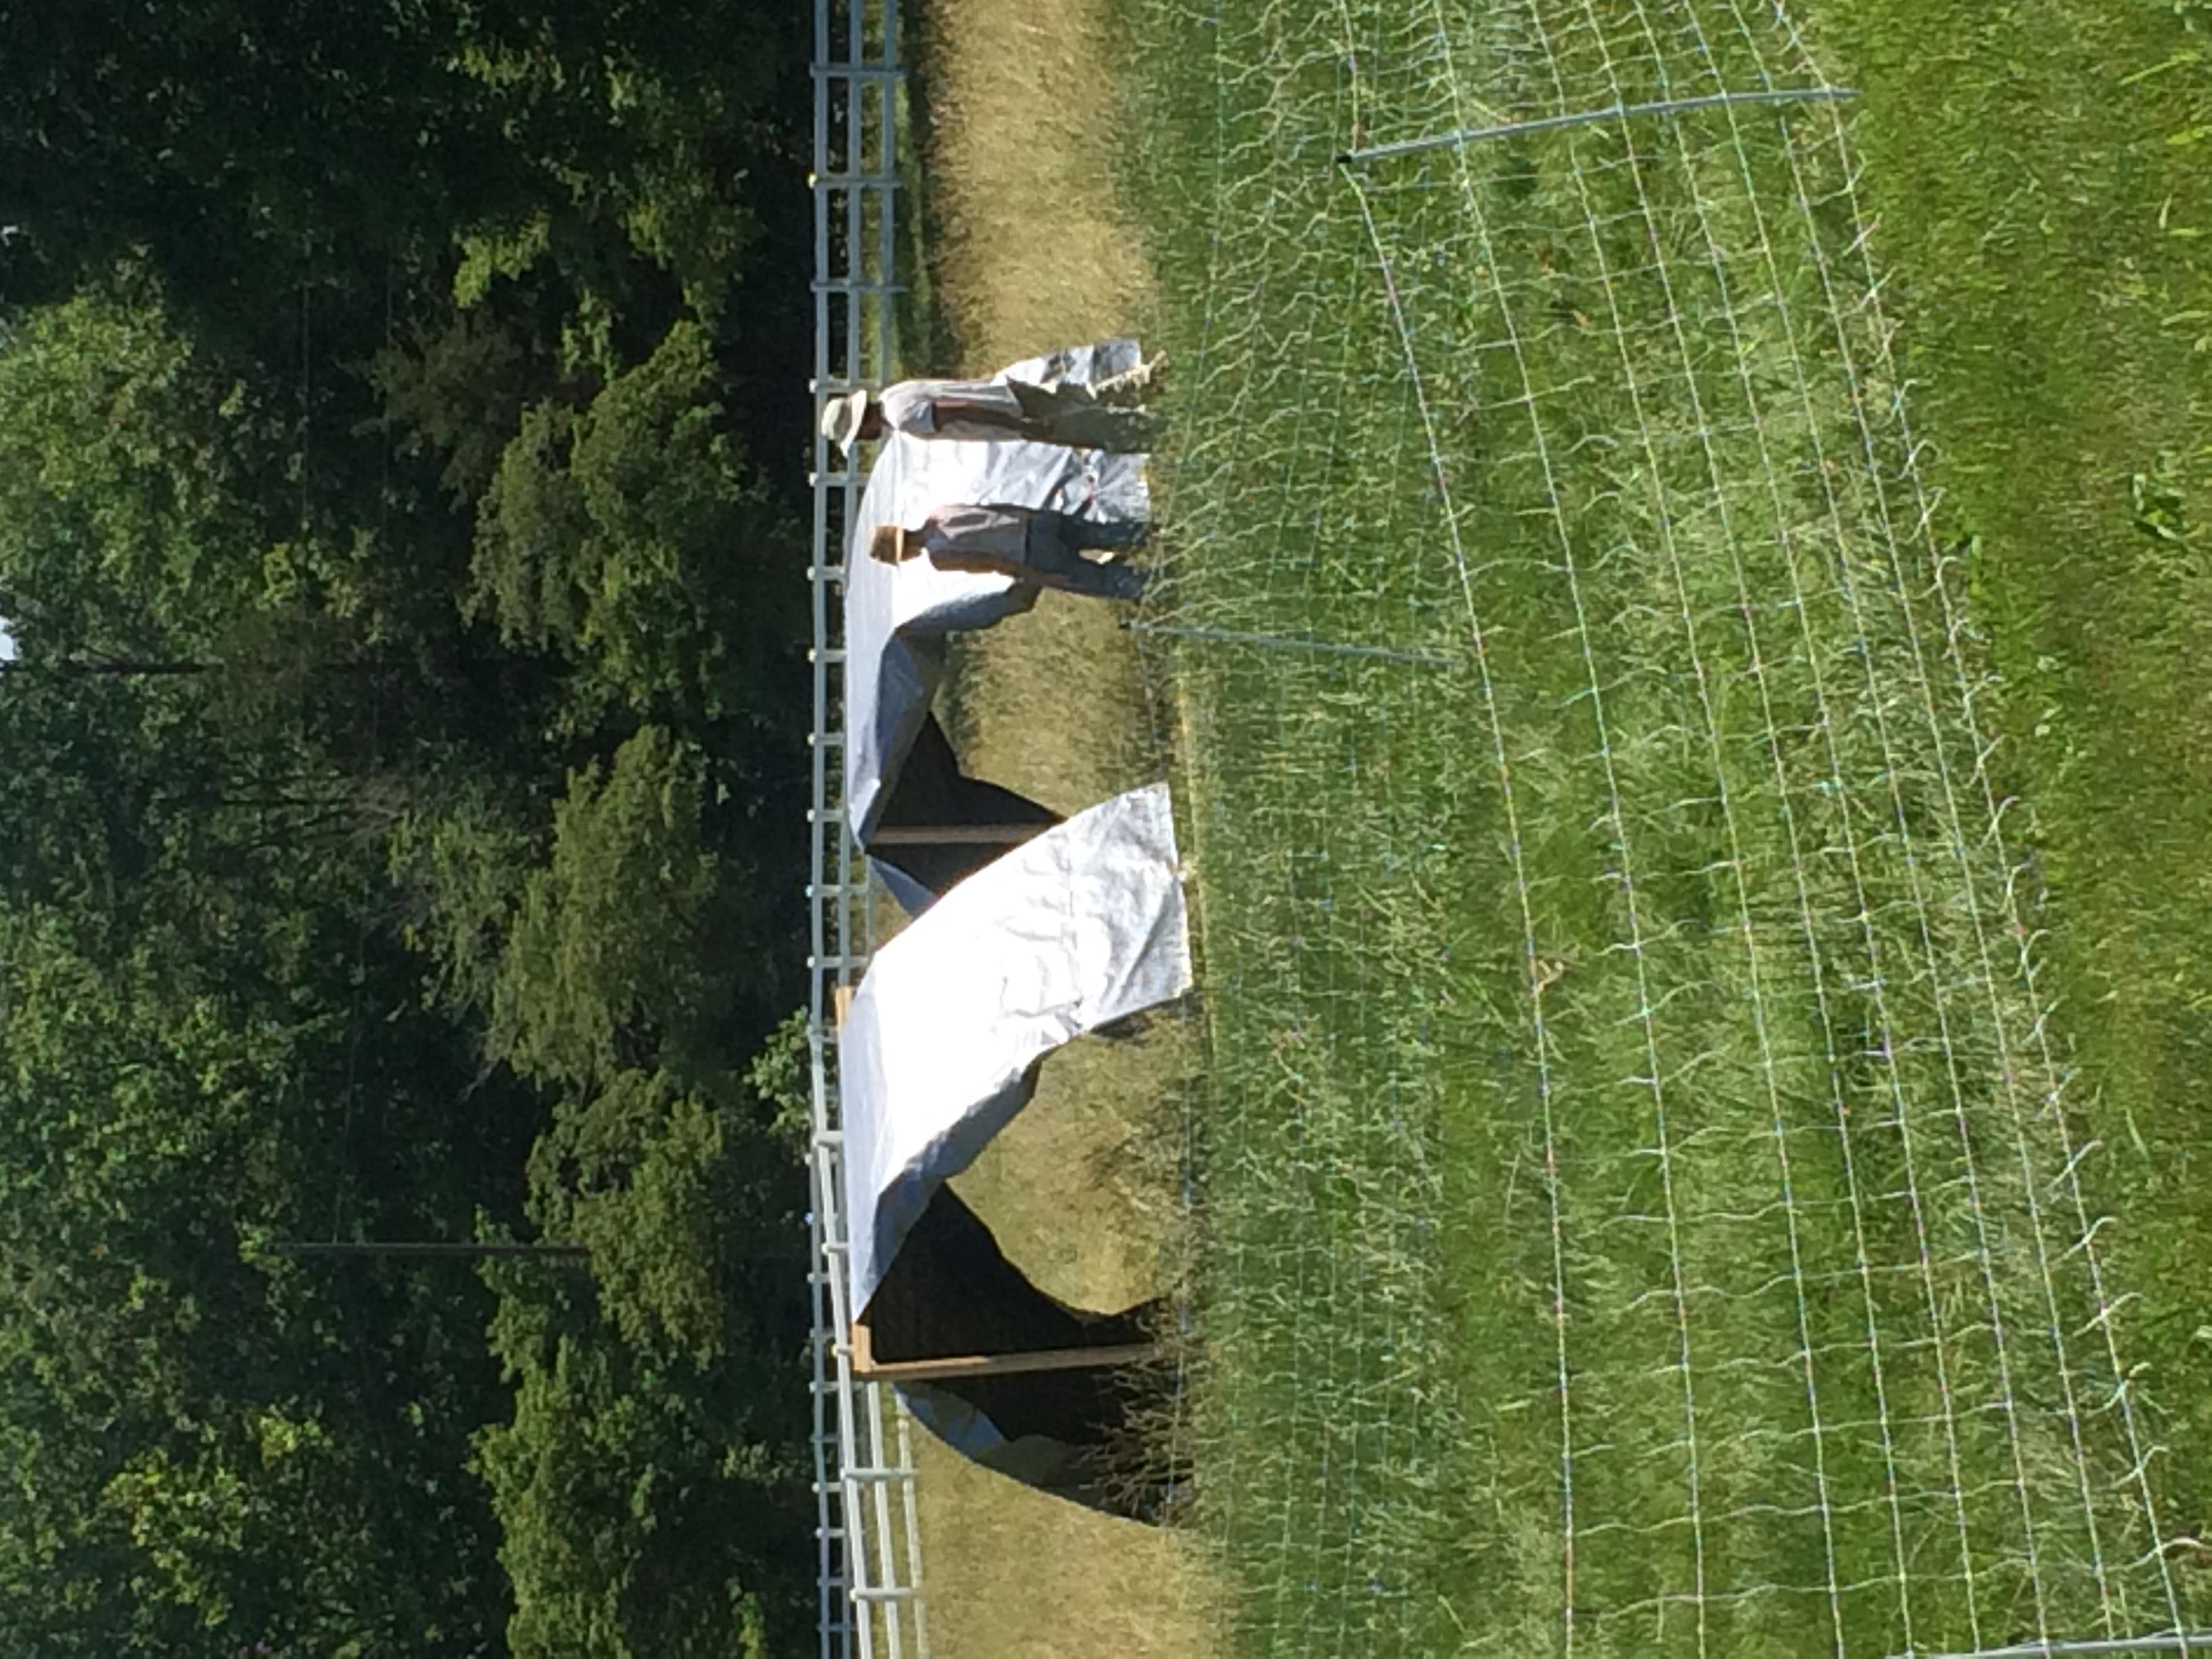 Marni and Jesse setting up shade shelters